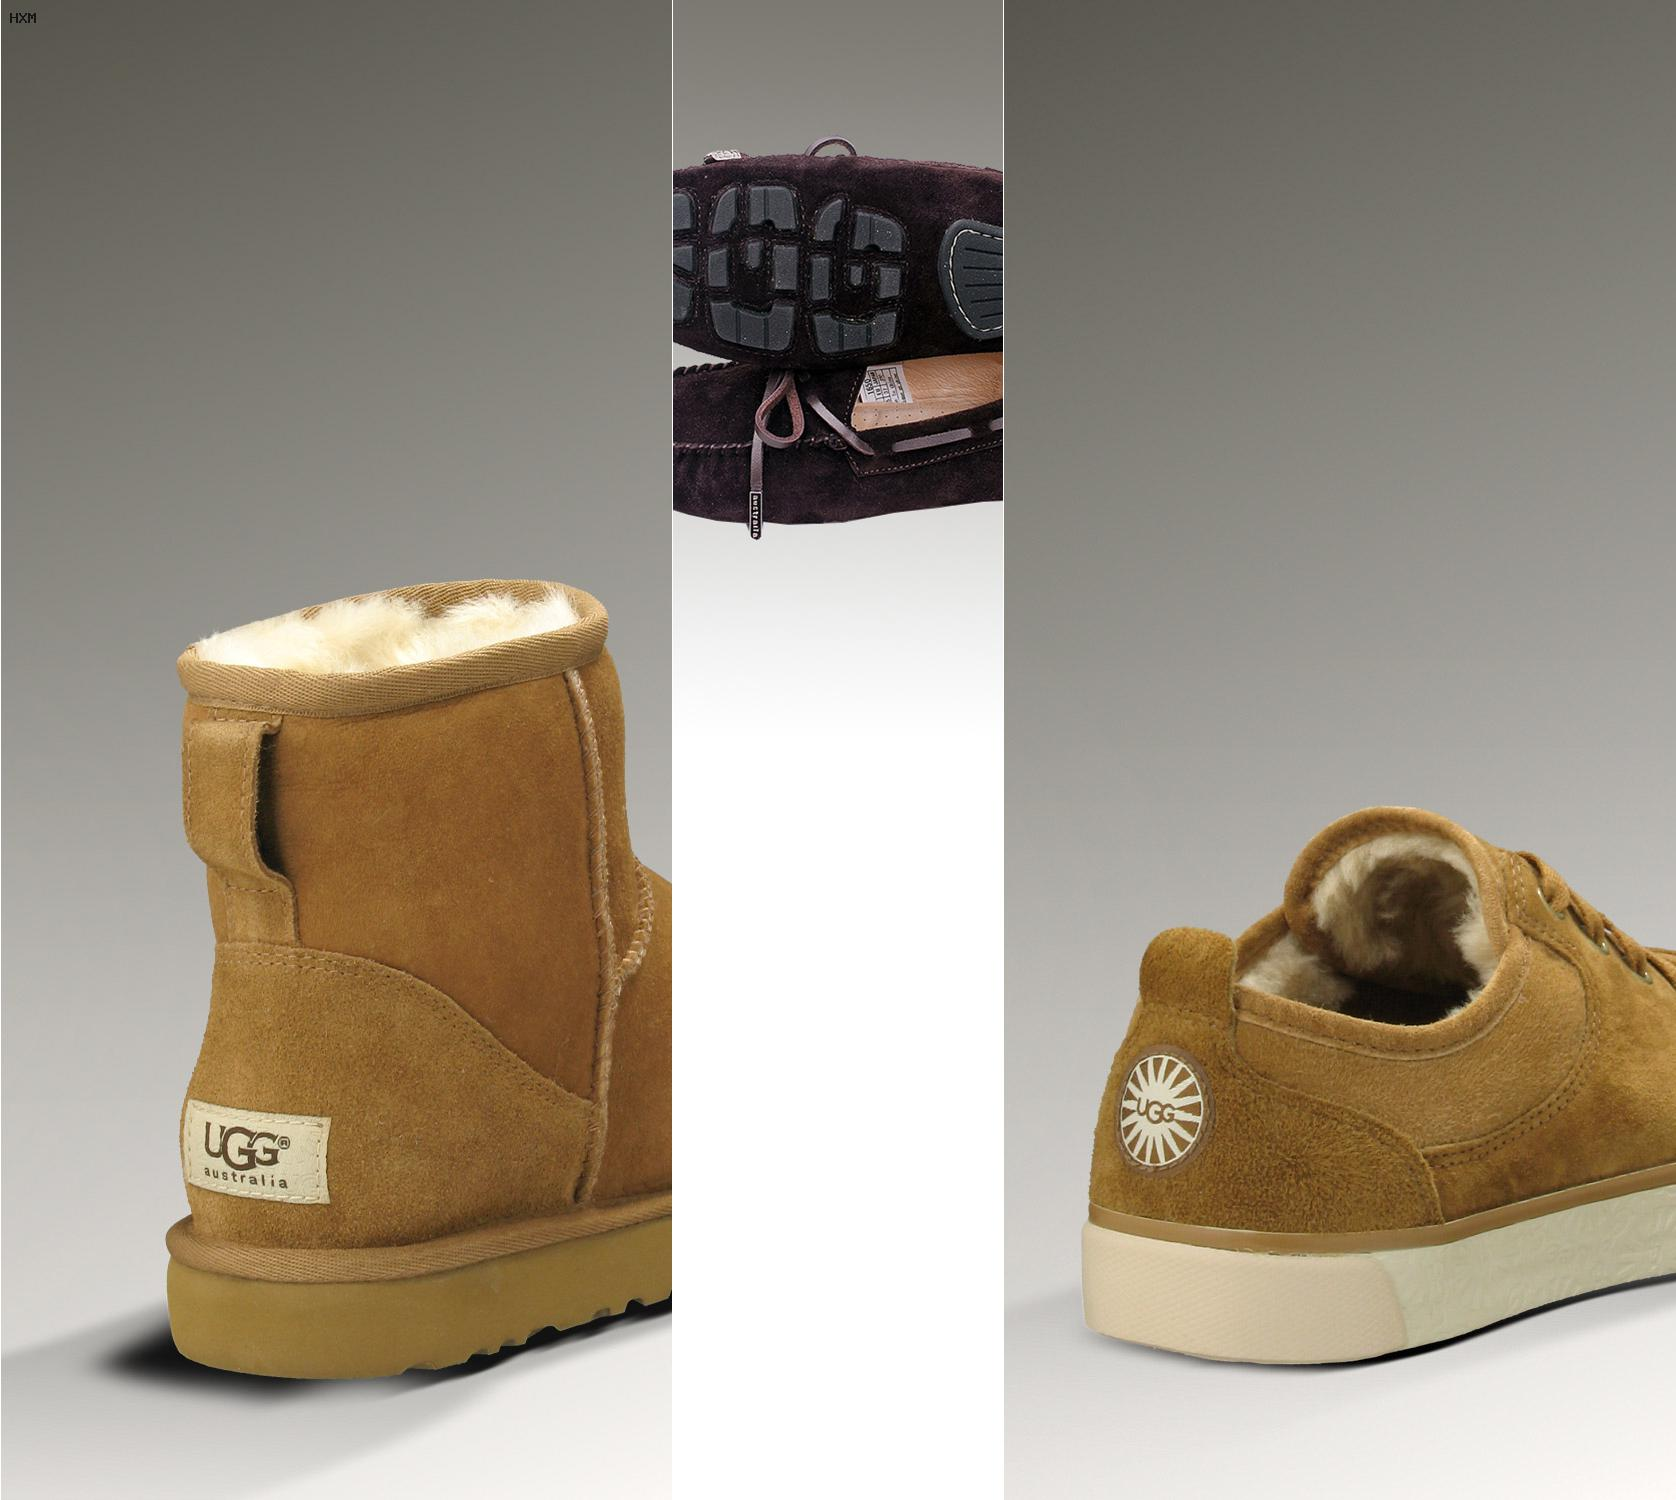 donde venden botas ugg en toluca